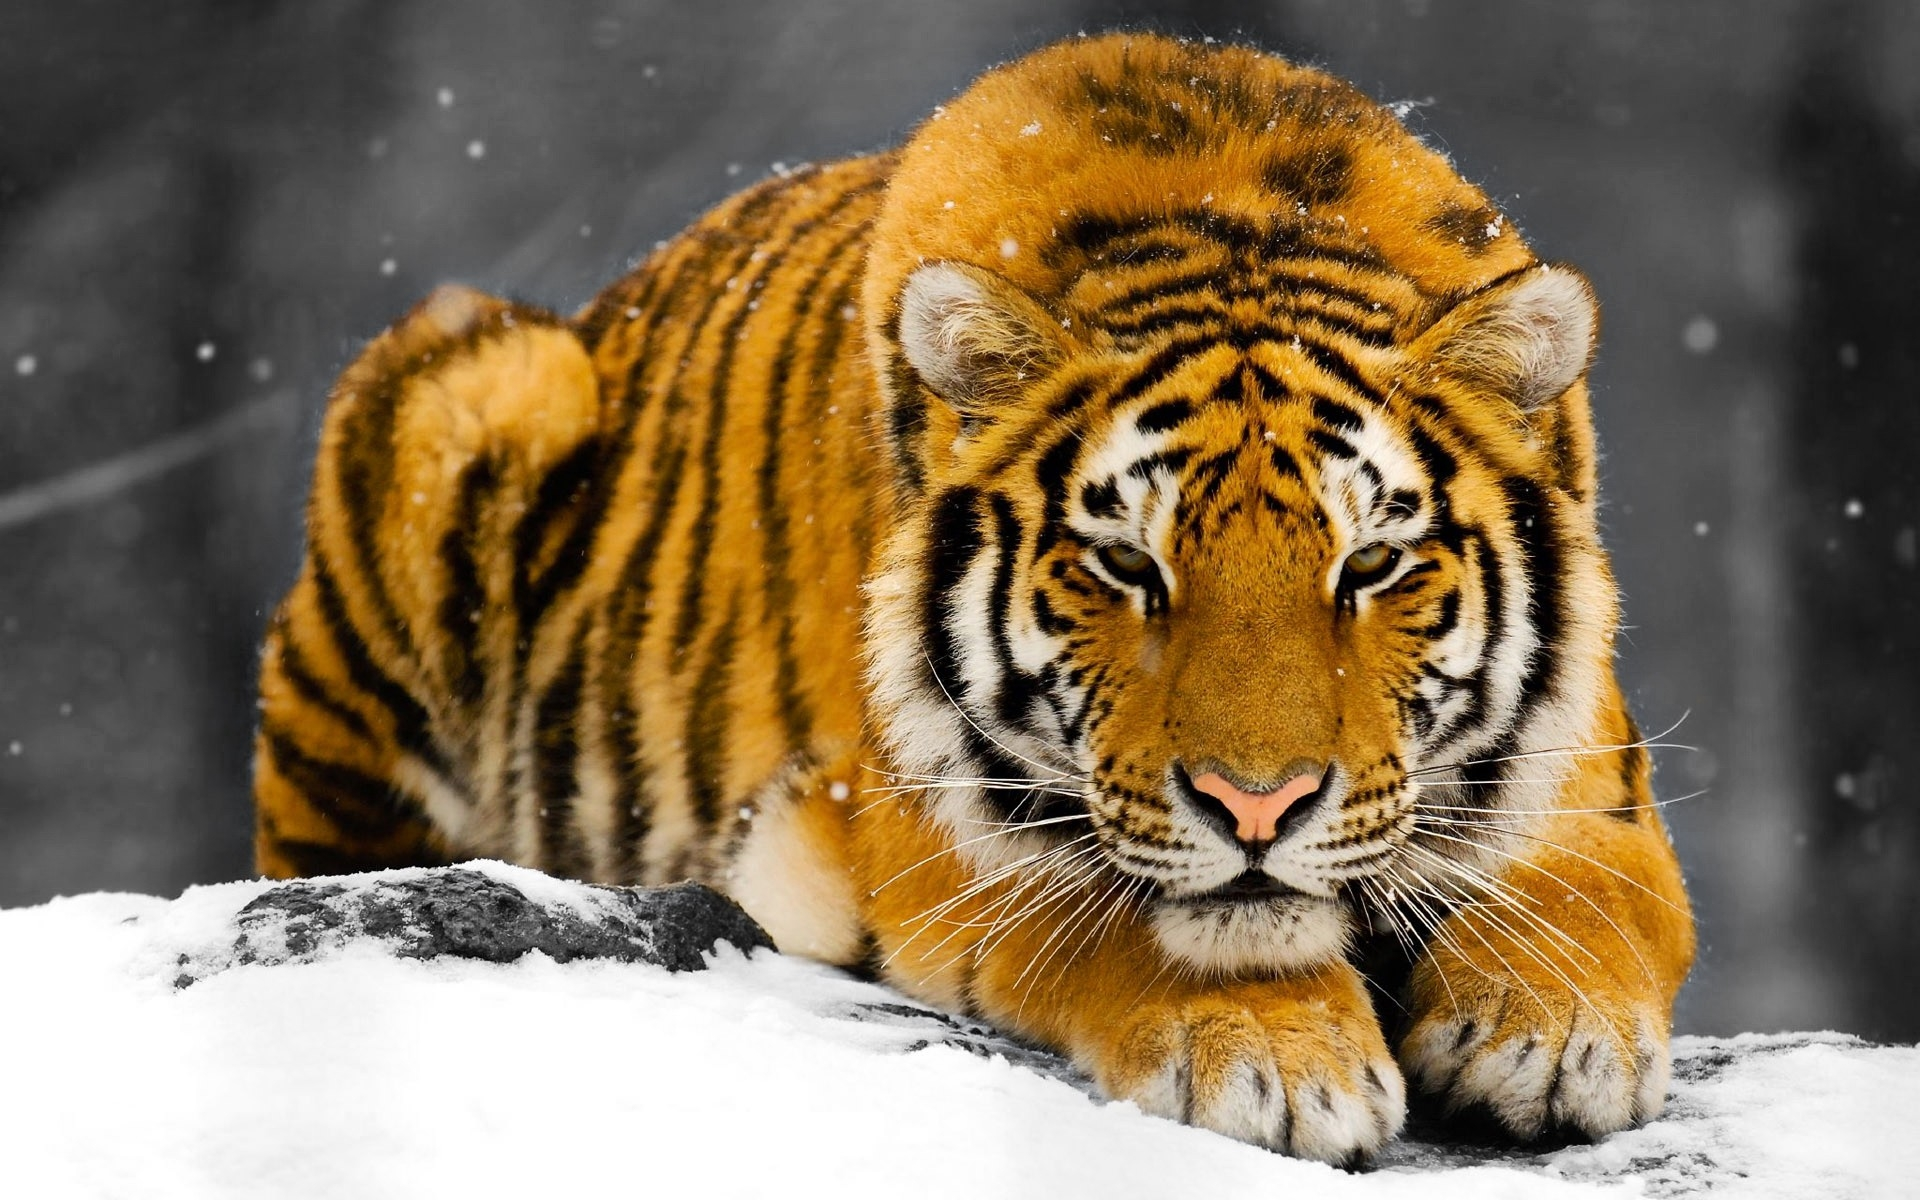 Fotos de portada tigres 21